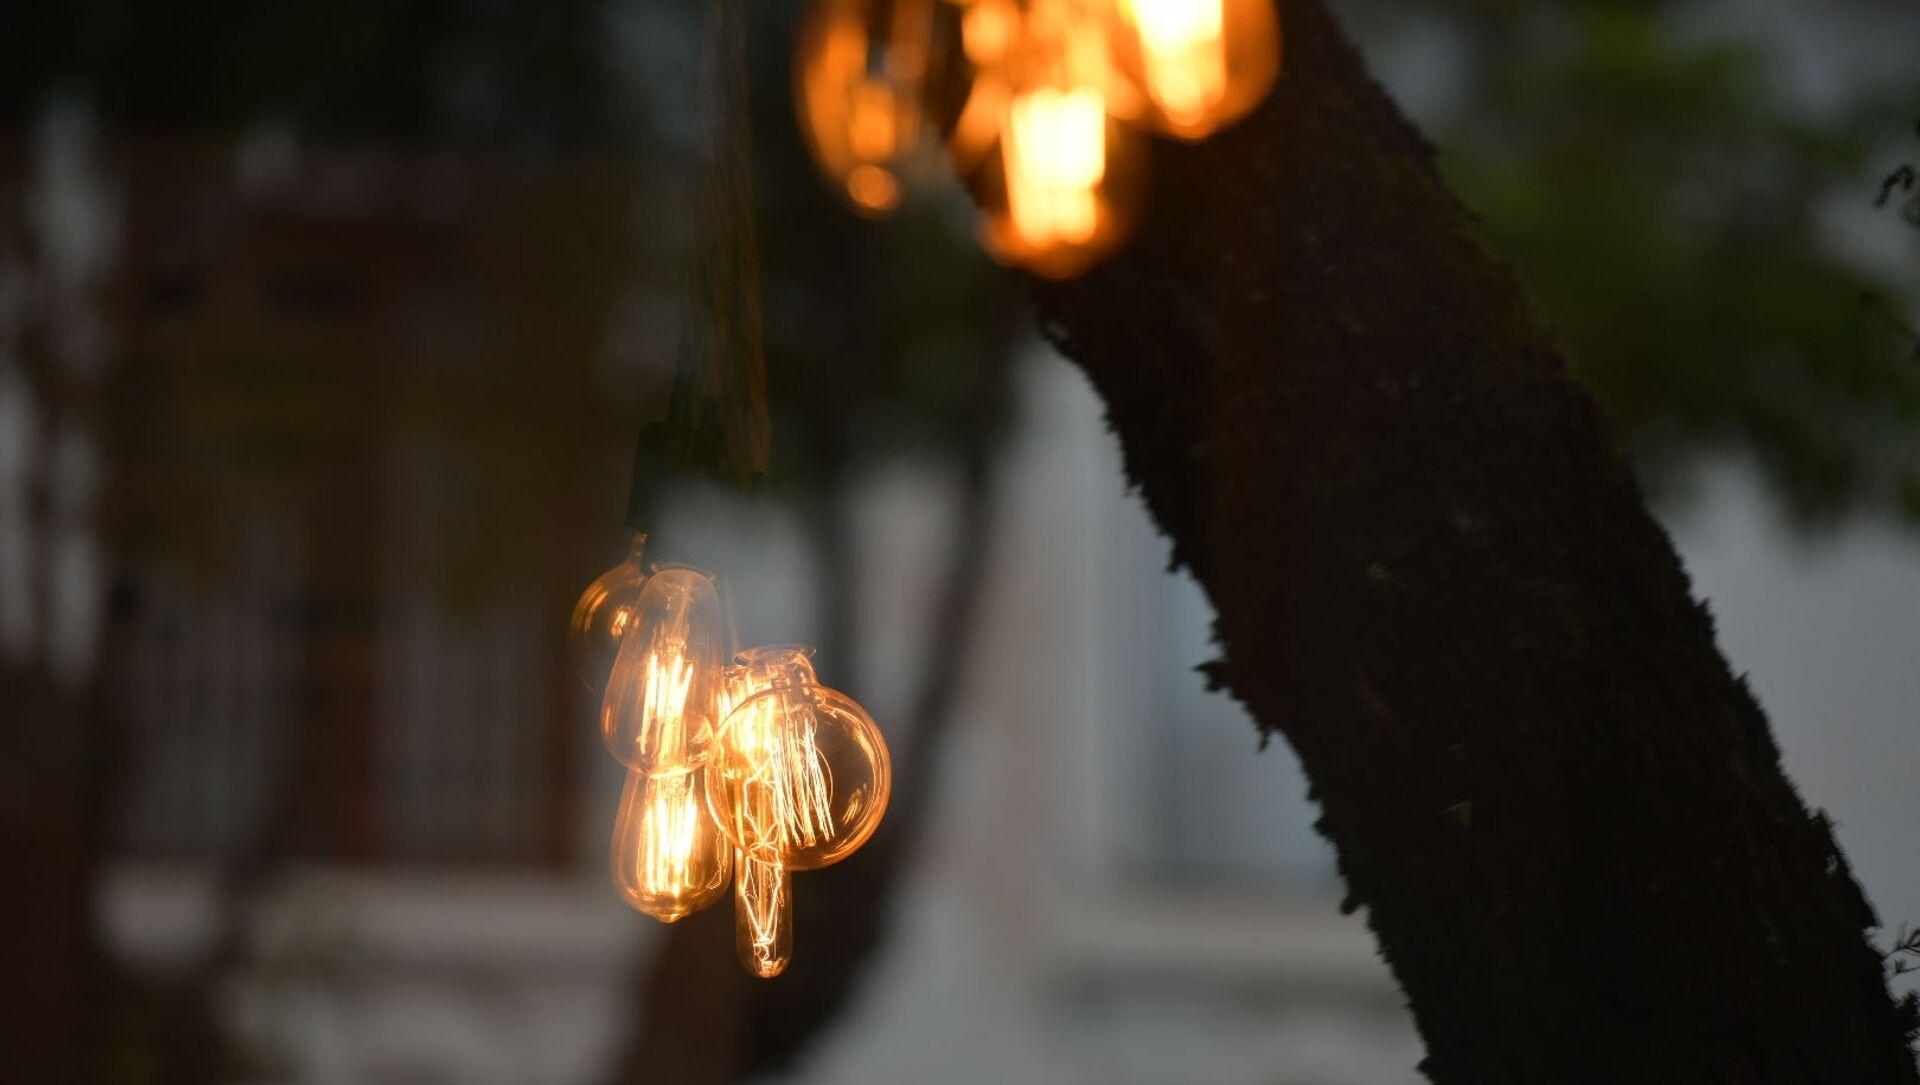 Лампочки  - Sputnik Абхазия, 1920, 07.10.2021